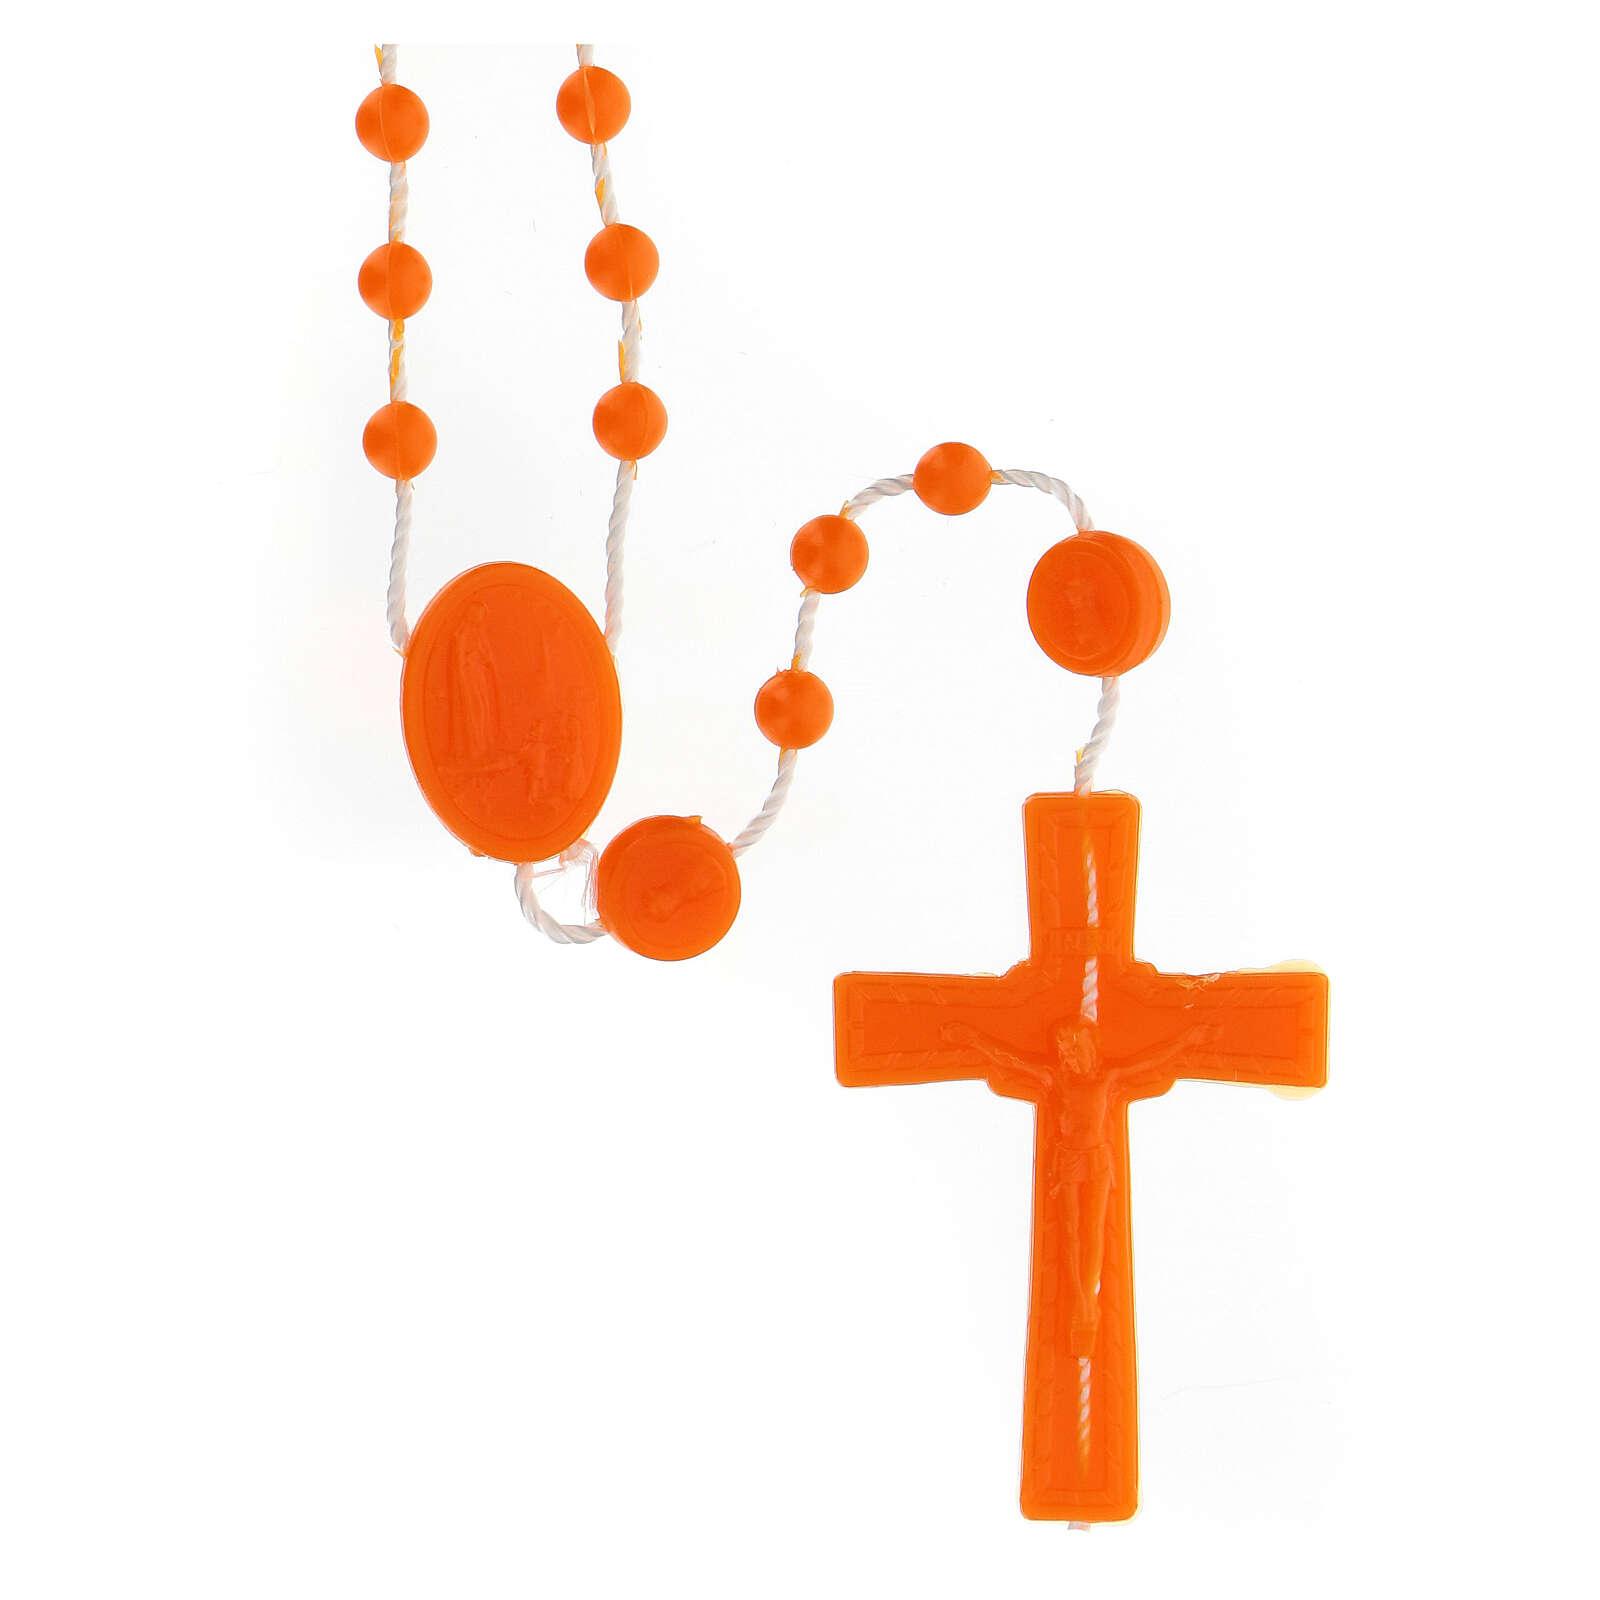 STOCK Chapelet Fatima nylon orange 4 mm 4